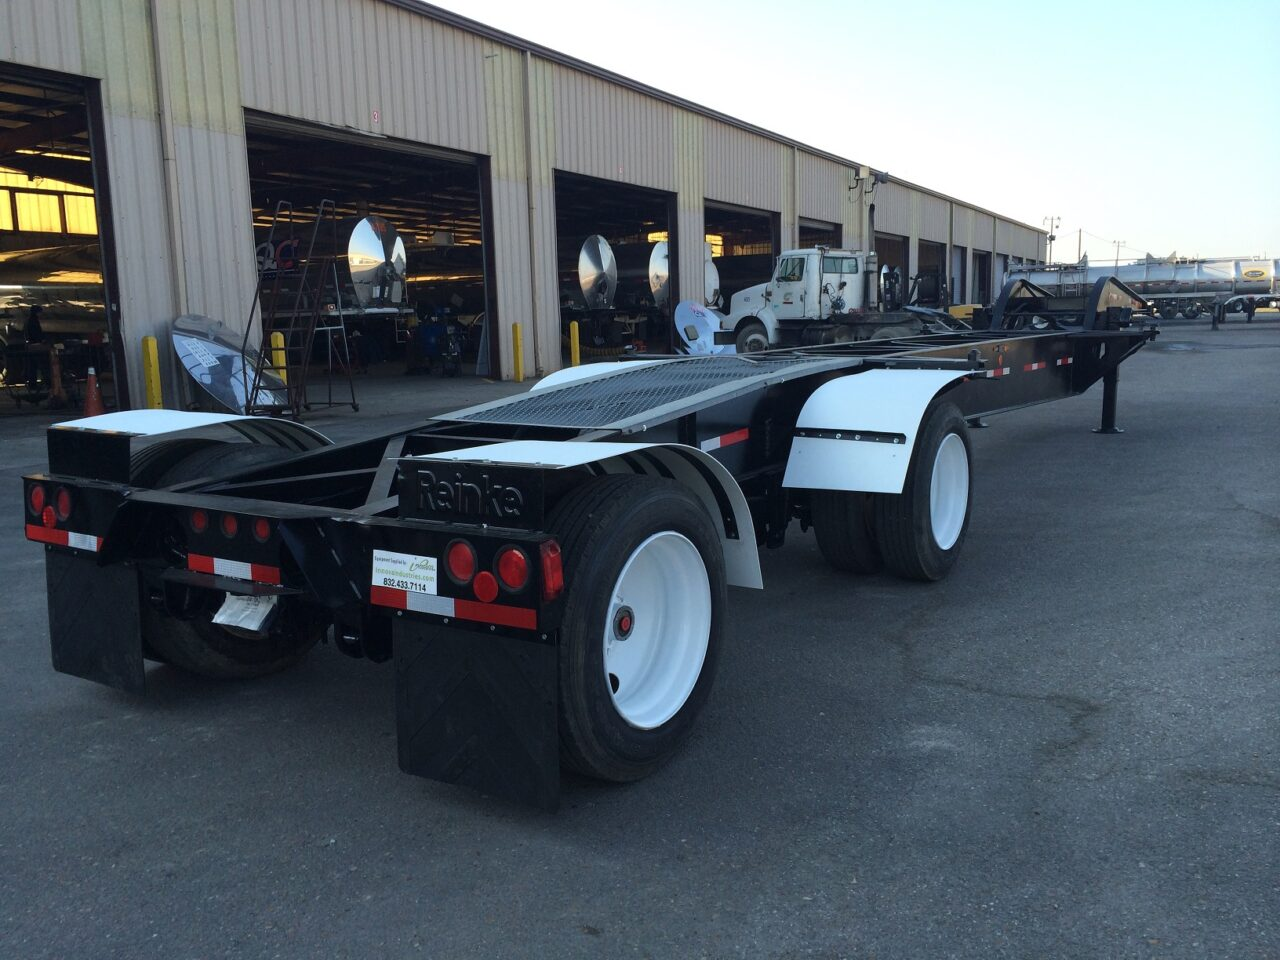 https://innovaindustries.com/wp-content/uploads/2015/02/refurbished-drop-deck-chassis-432047-1lr-1280x960.jpg